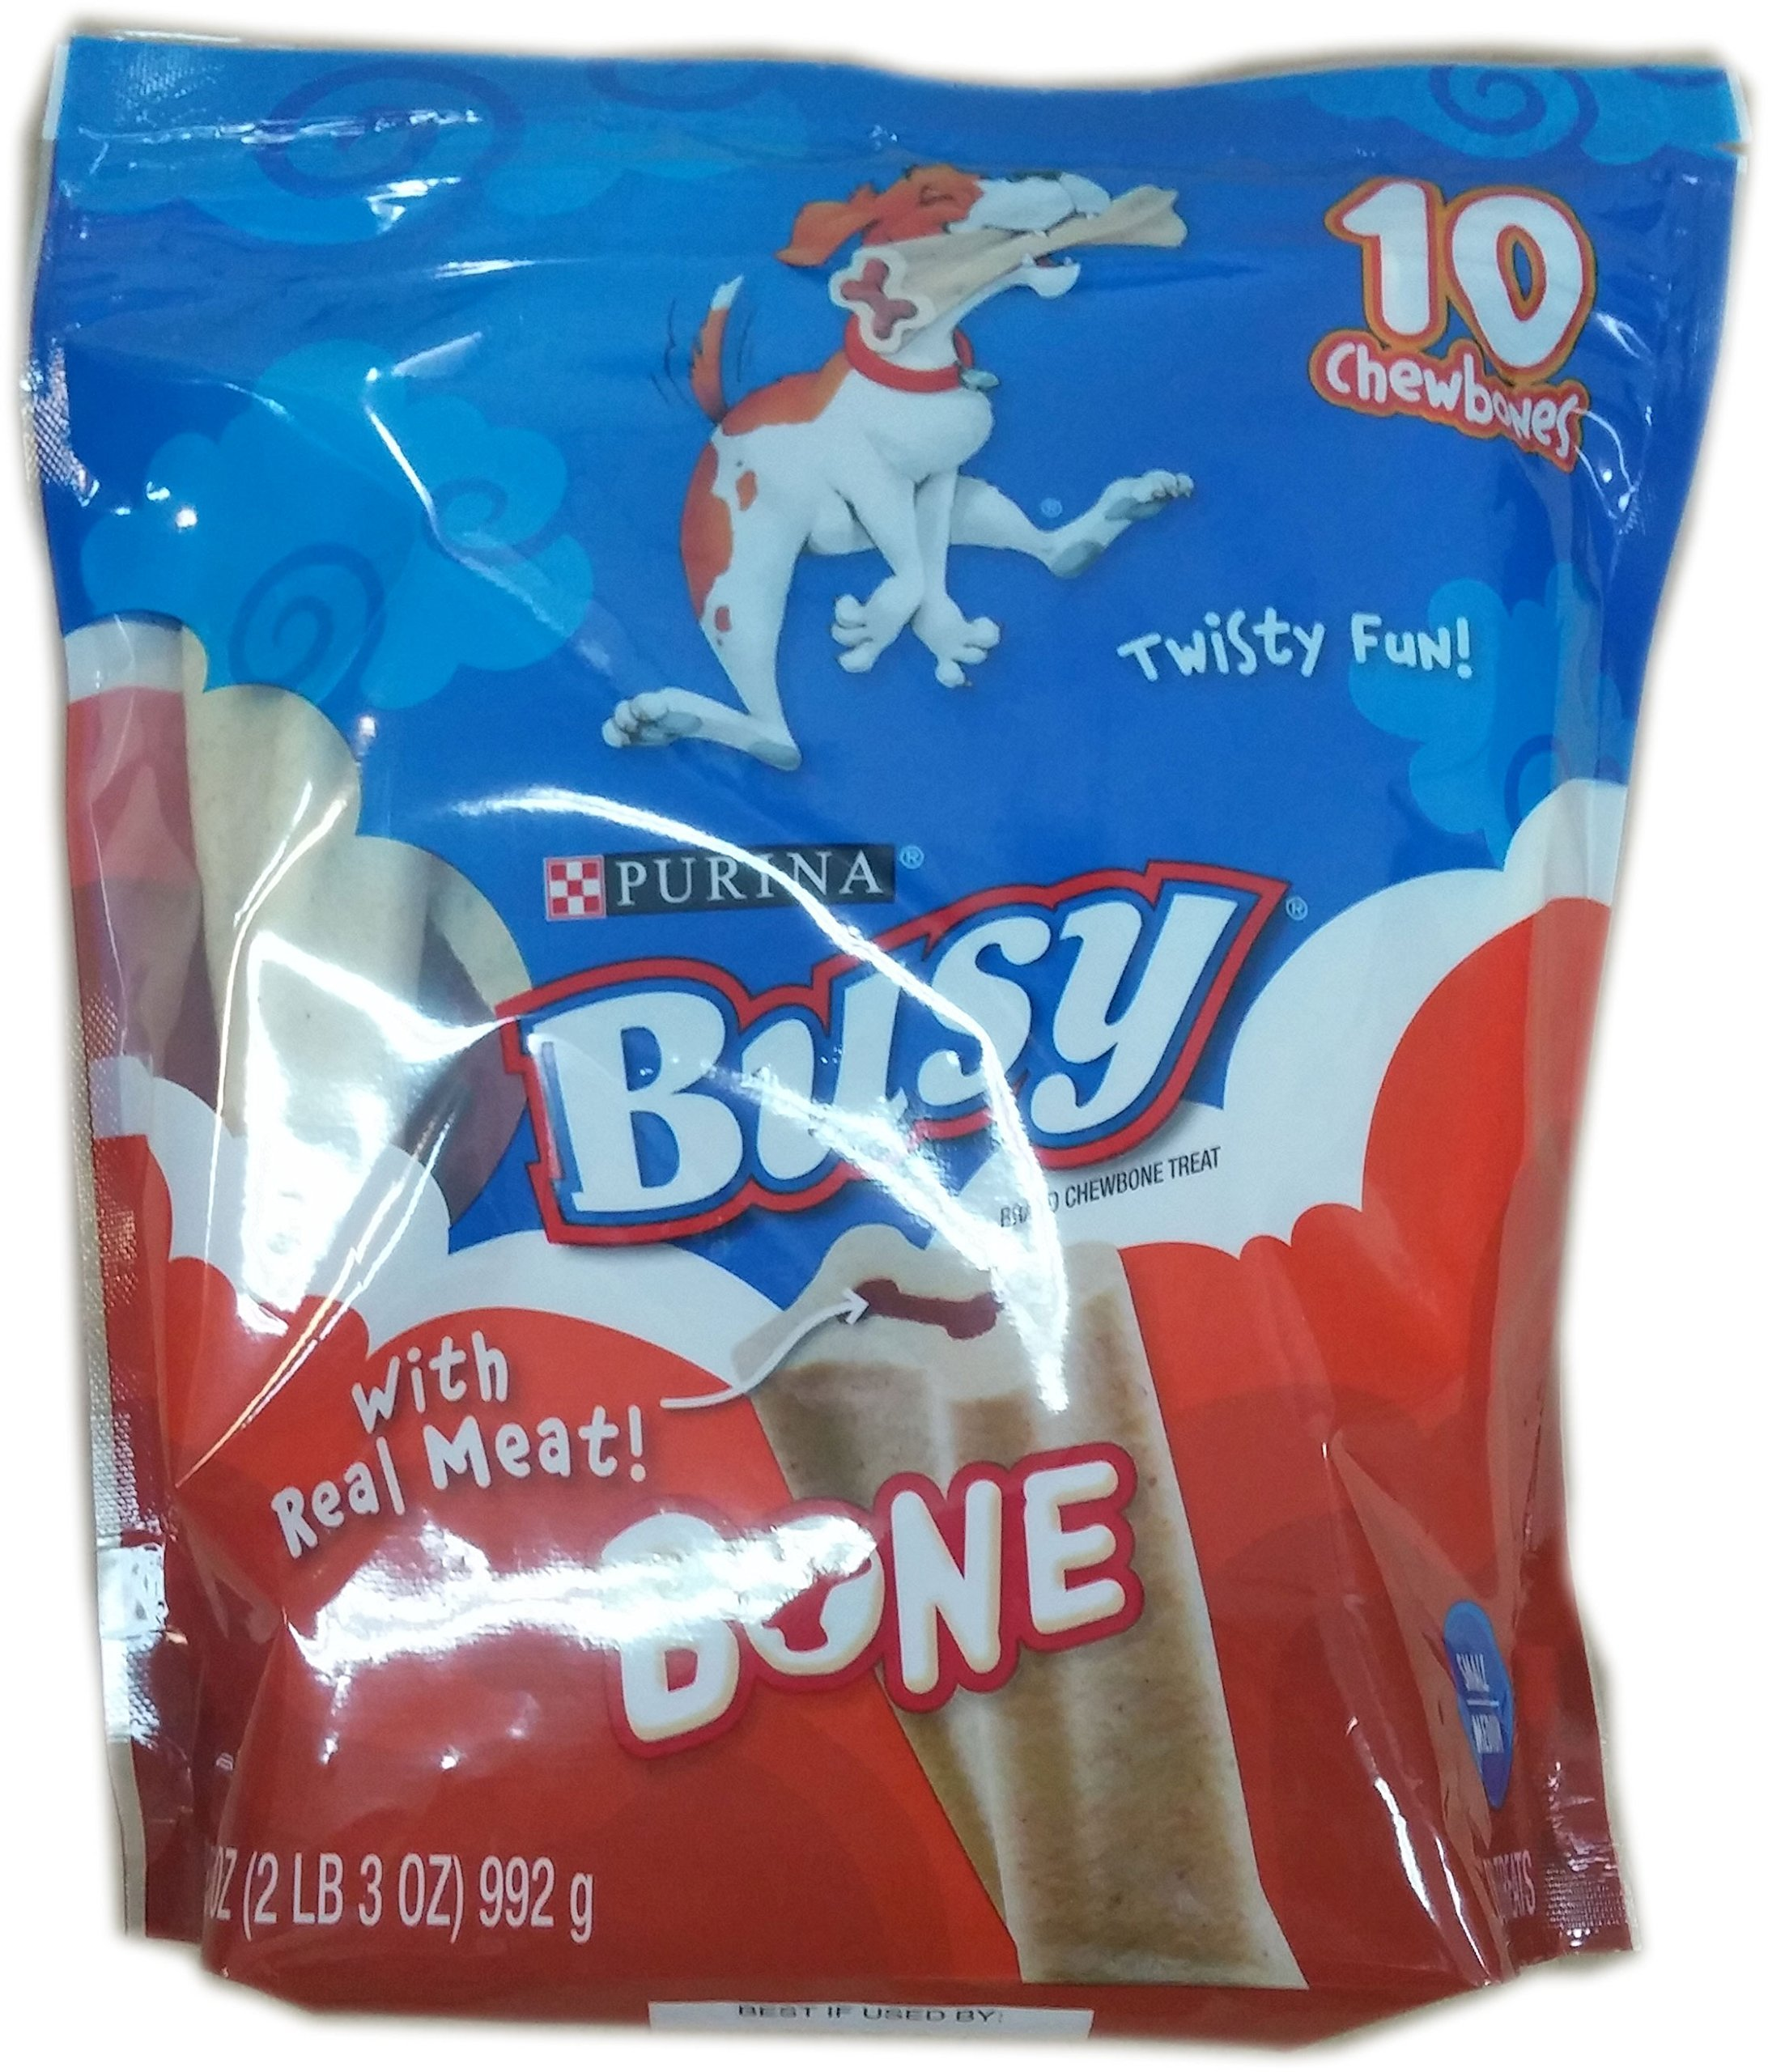 Busy Purina Bone Chewbone Treats - 10ct 35oz